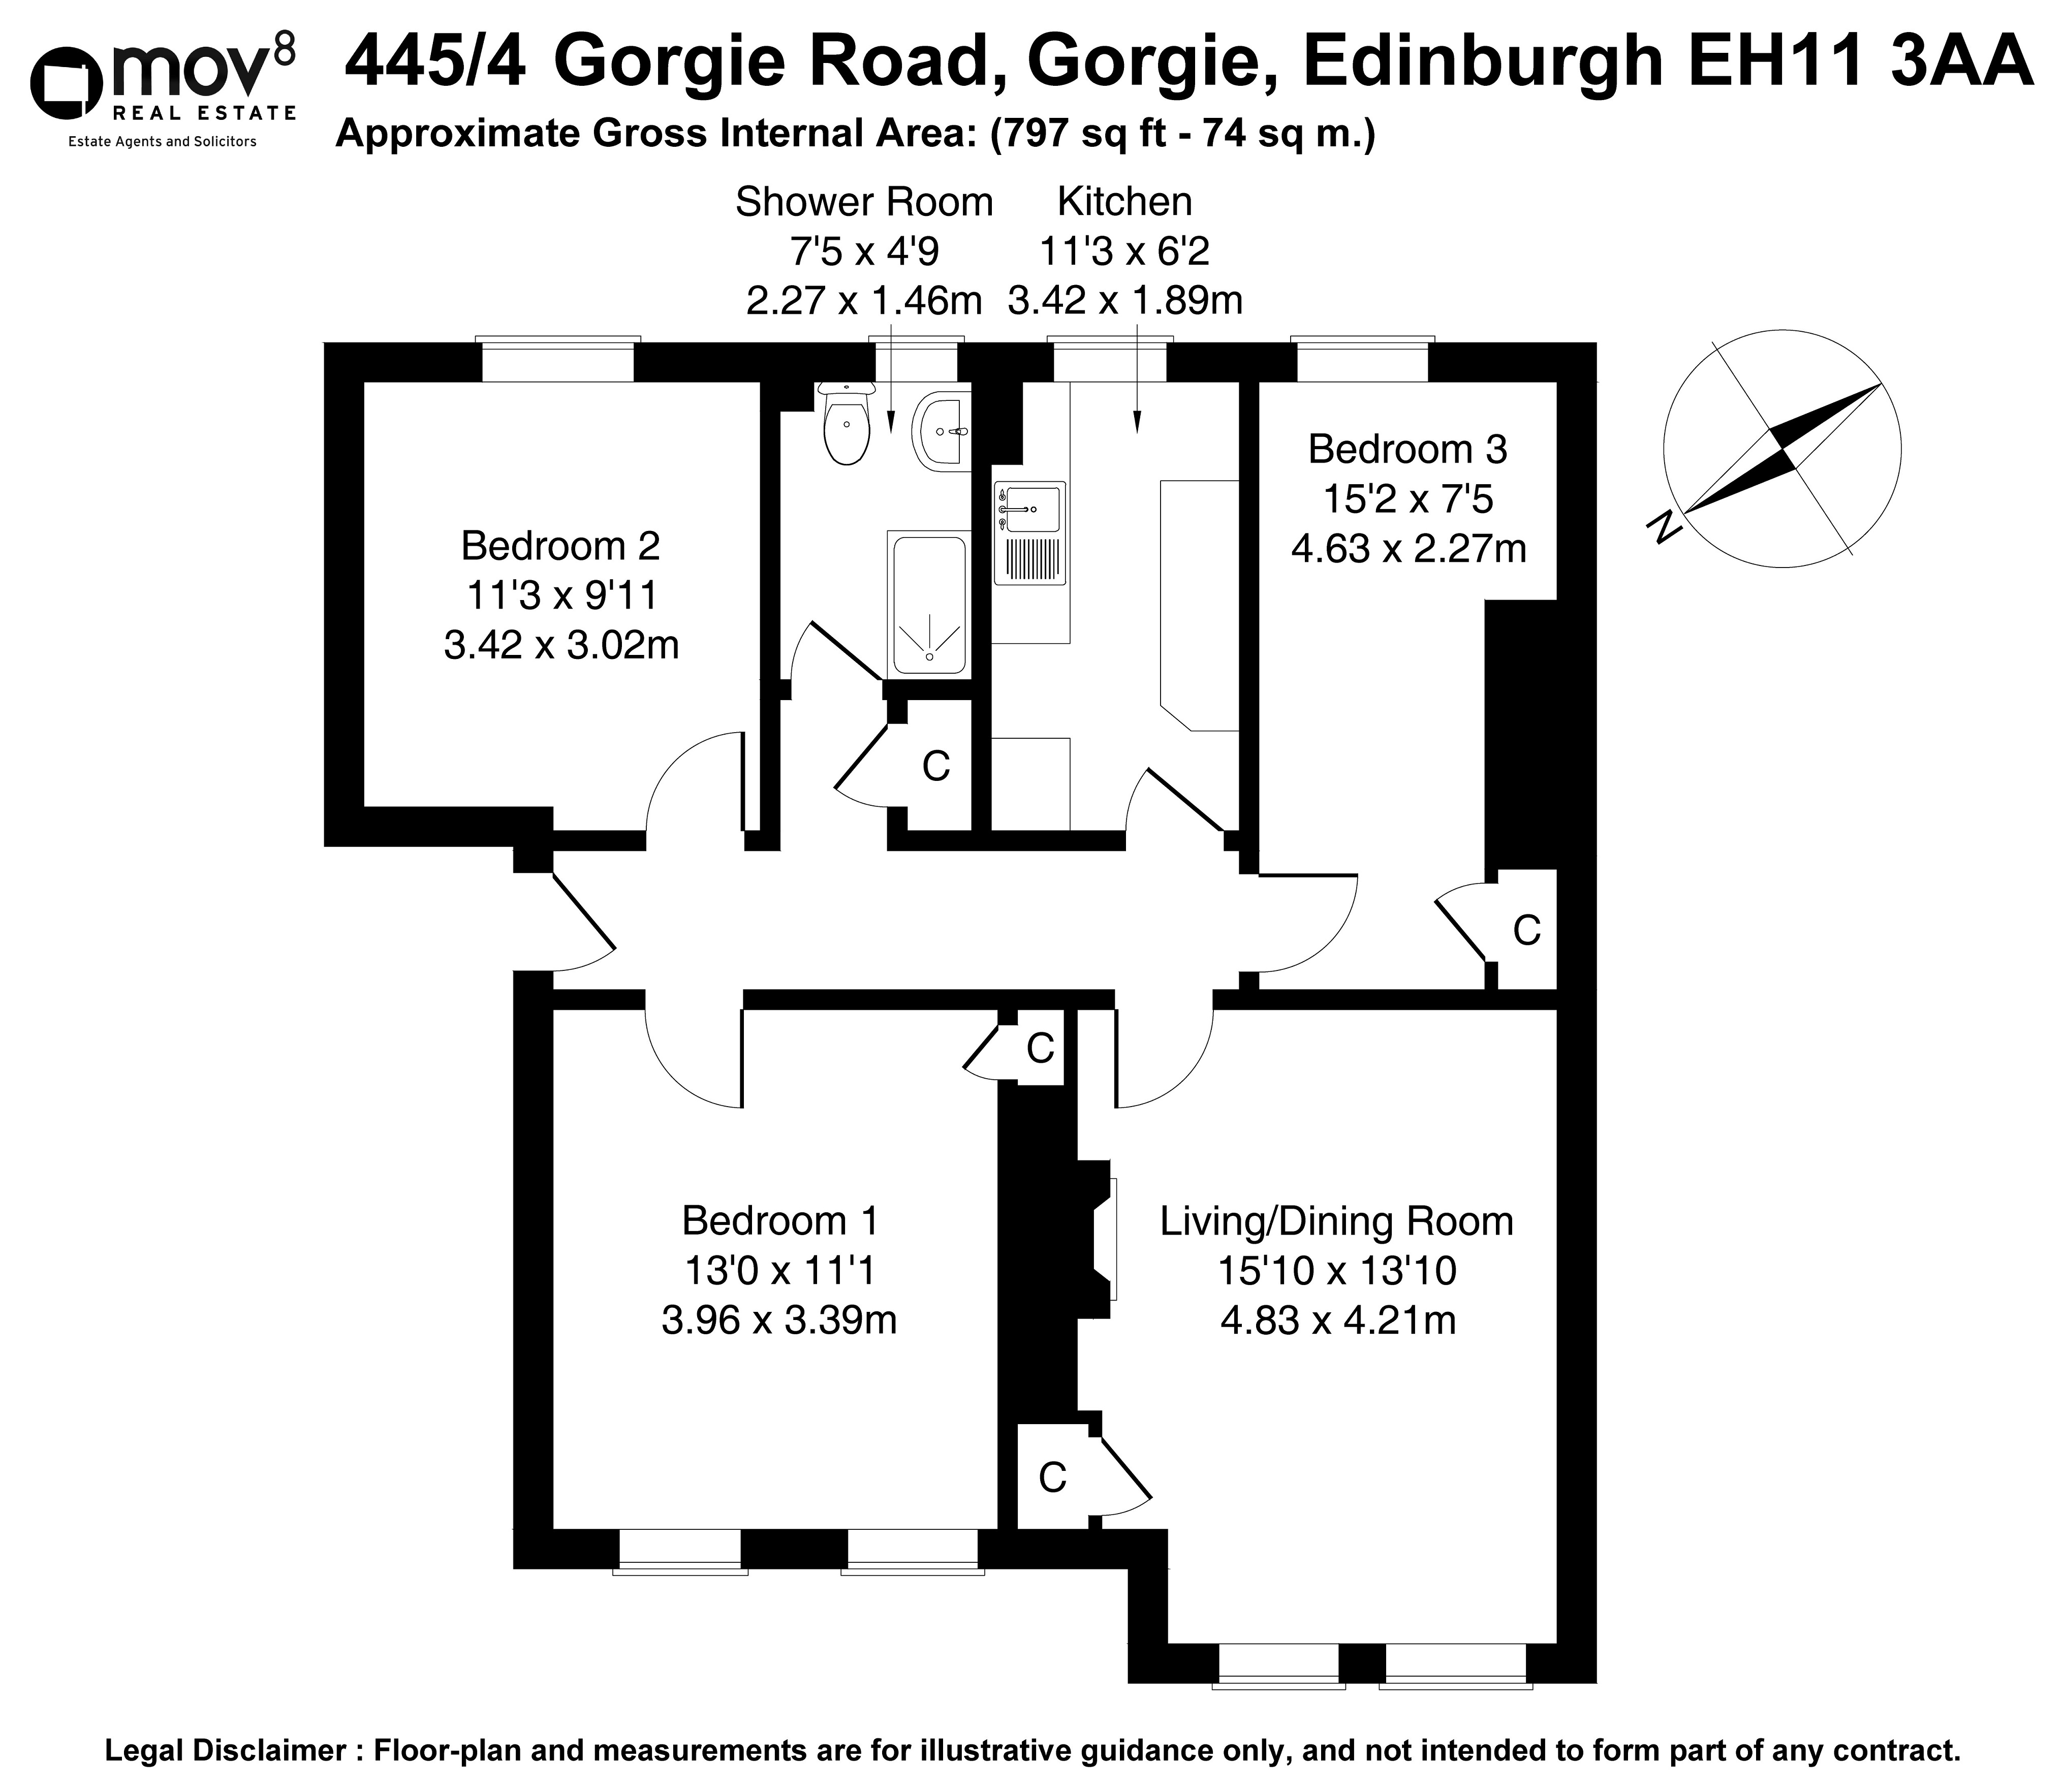 Floorplan 1 of 445/4, Gorgie Road, Gorgie, Edinburgh, EH11 3AA